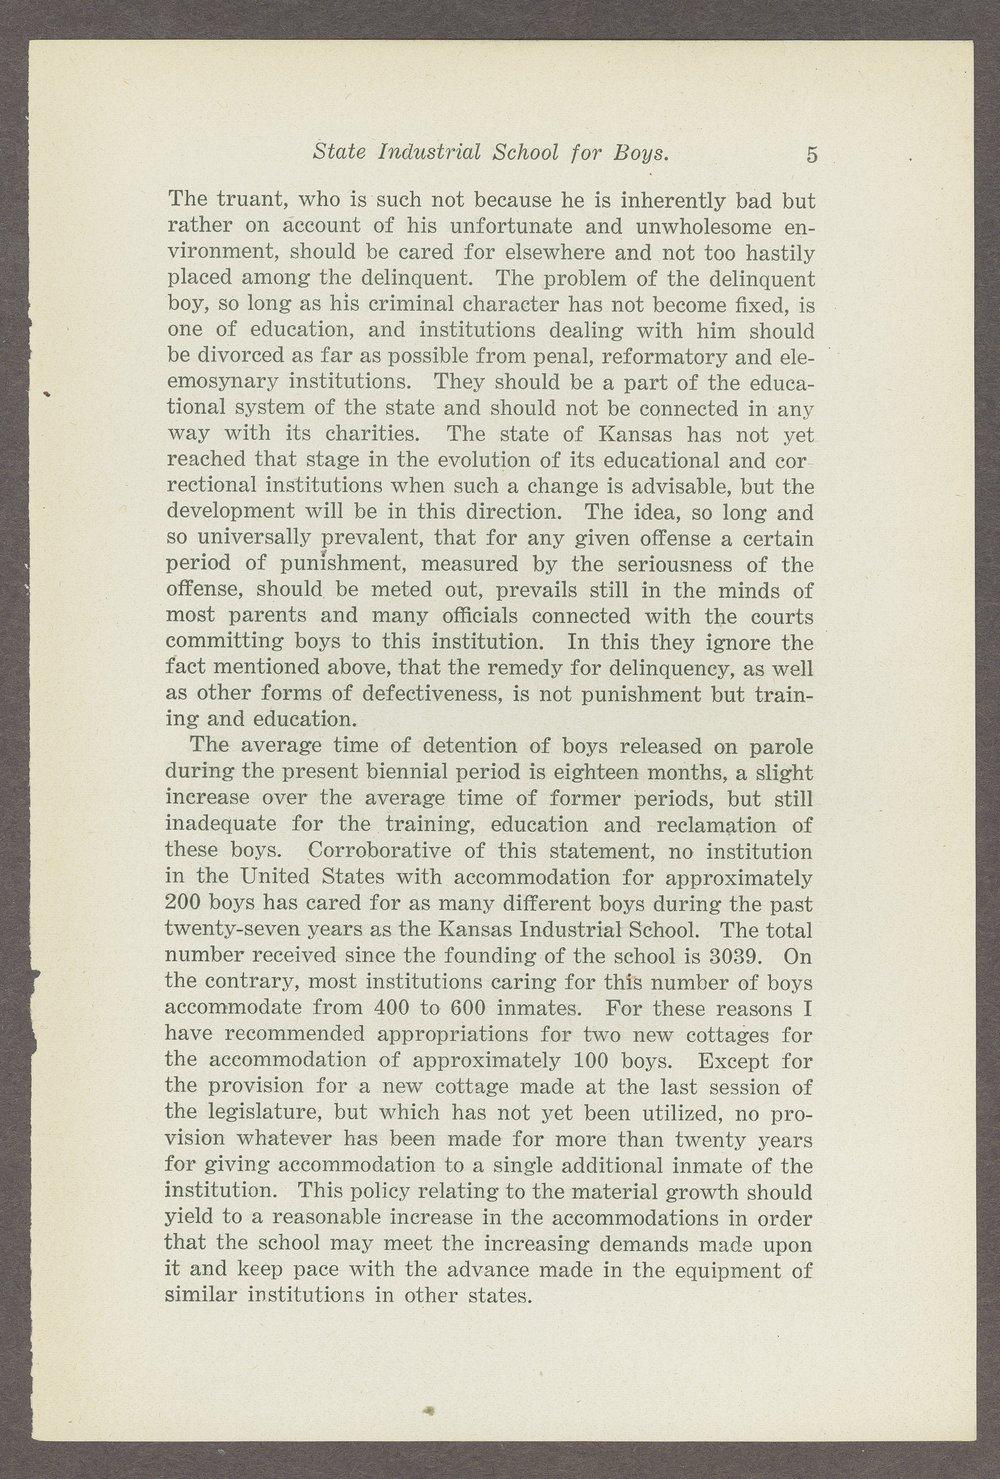 Biennial report of the Boys Industrial School, 1908 - 5